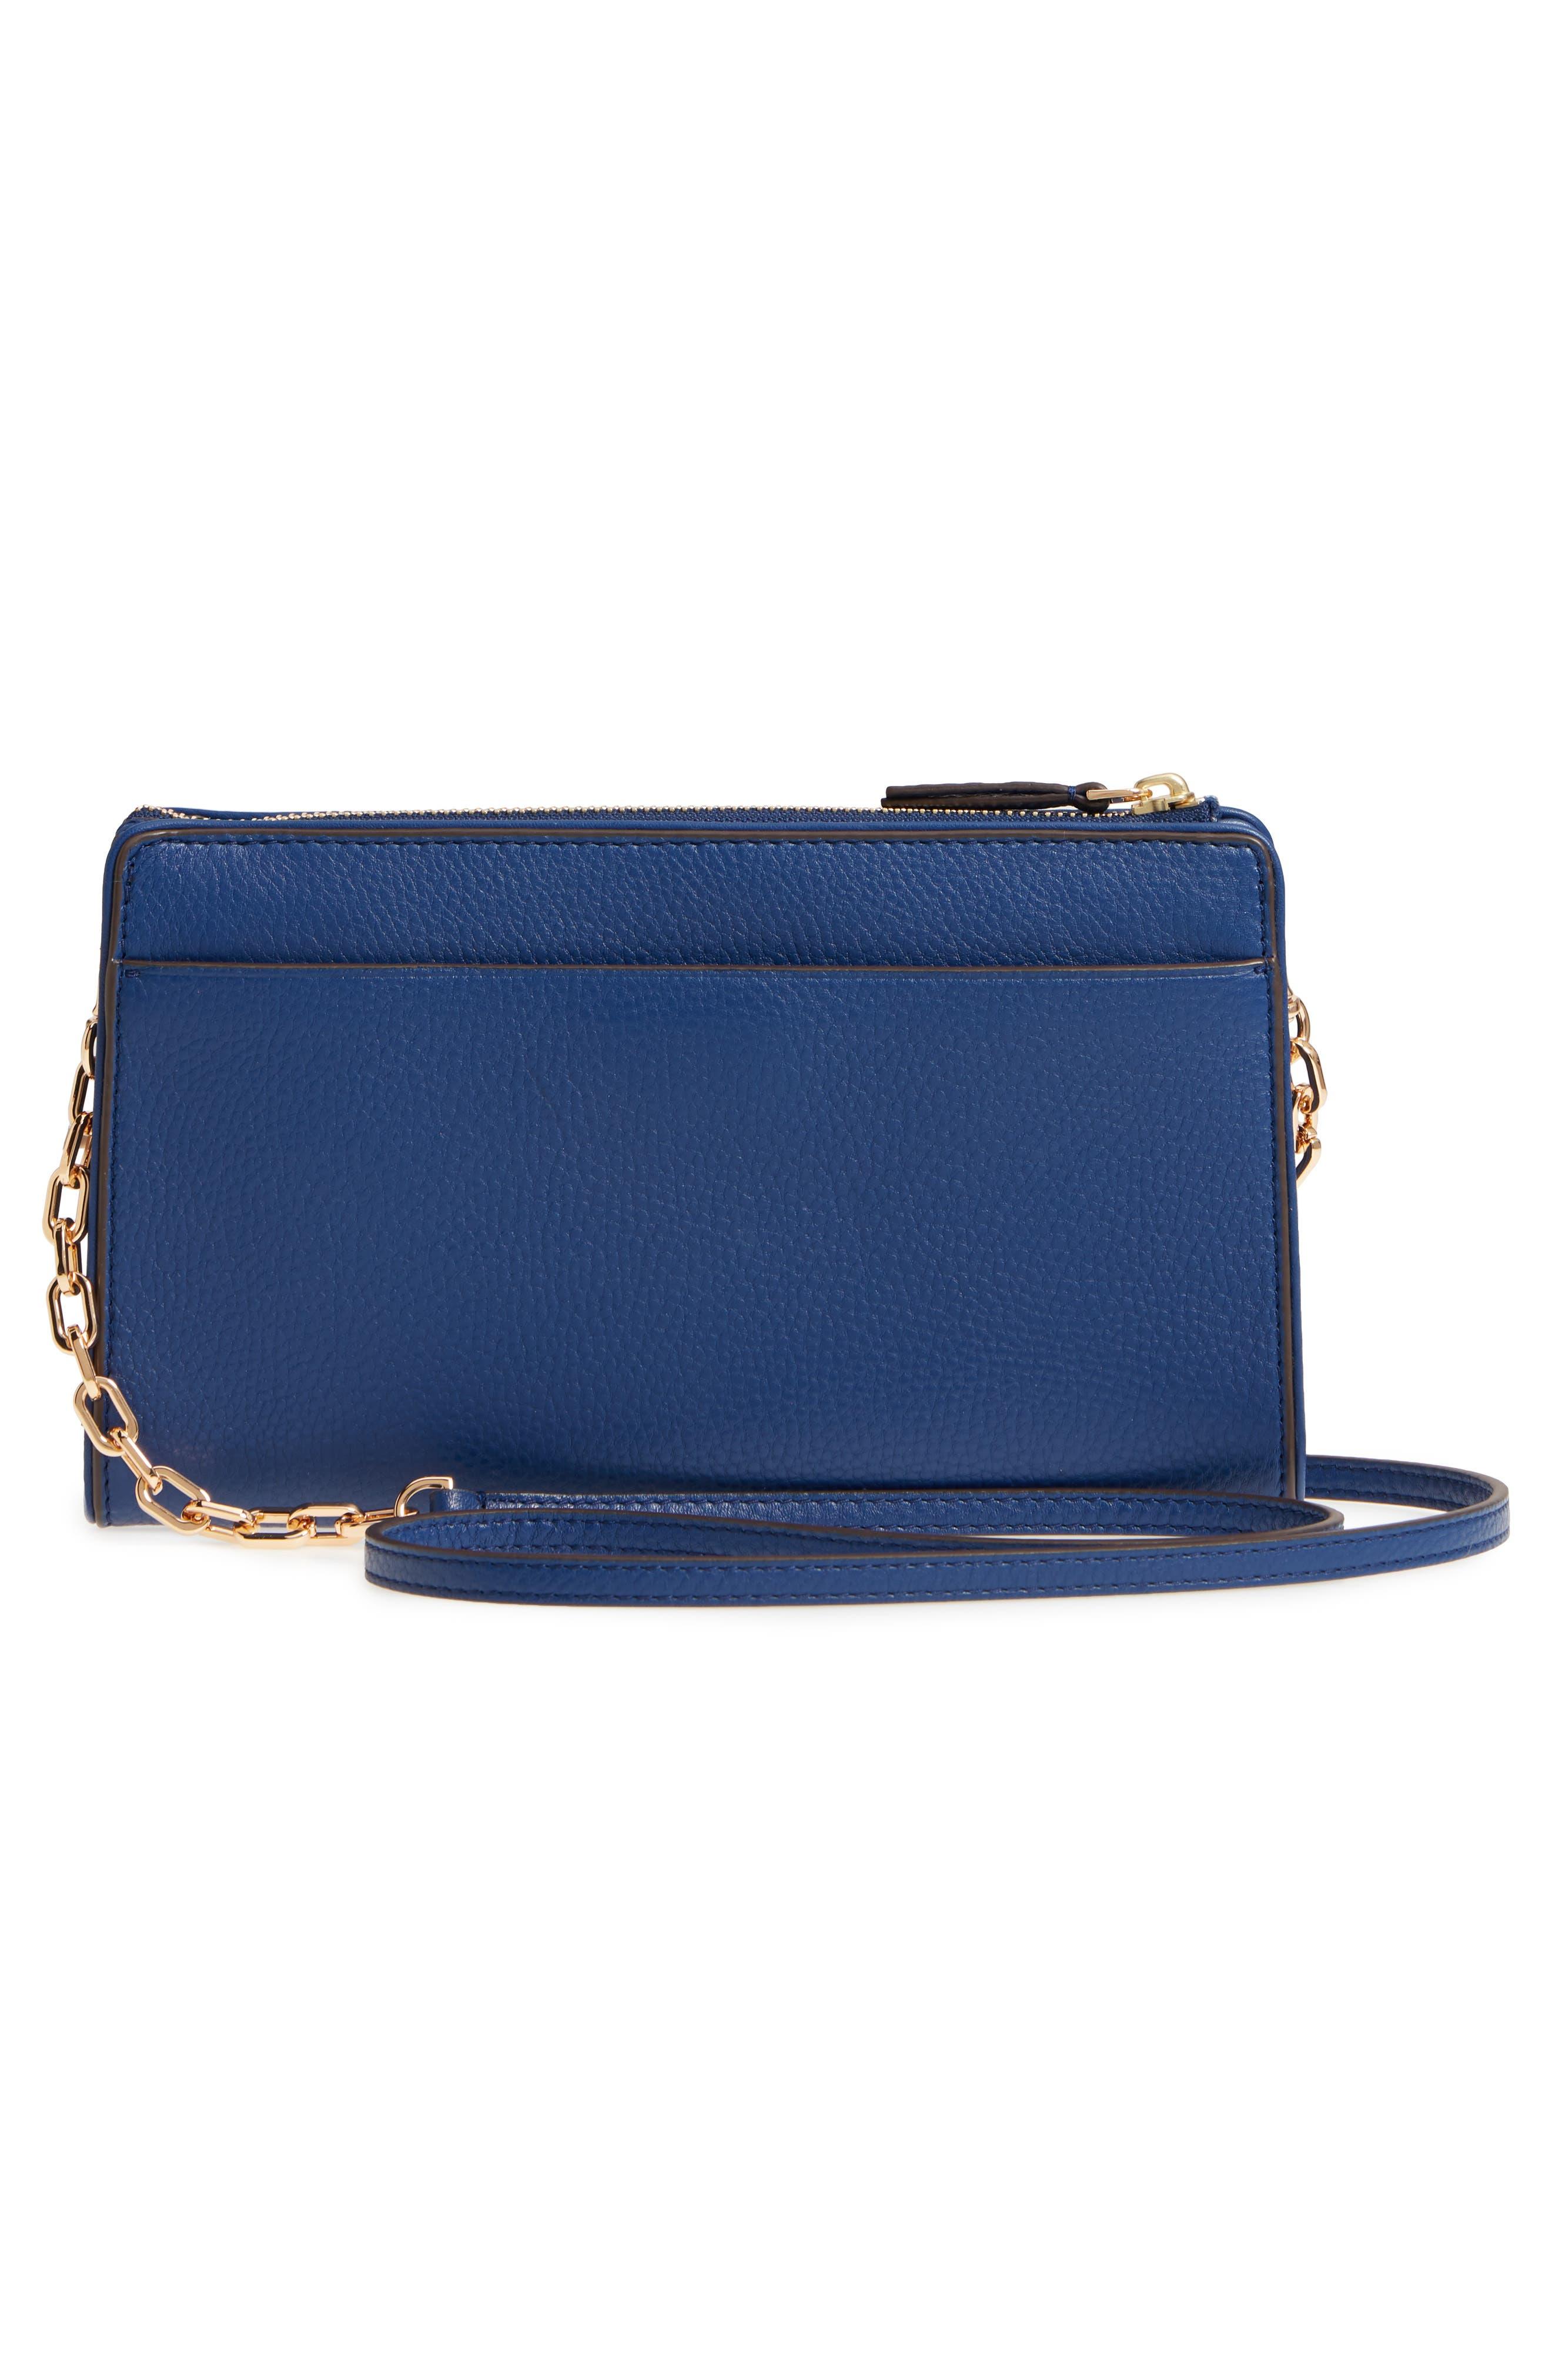 Marsden Leather Wallet Crossbody Bag,                             Alternate thumbnail 3, color,                             FRESH BLUEBERRY